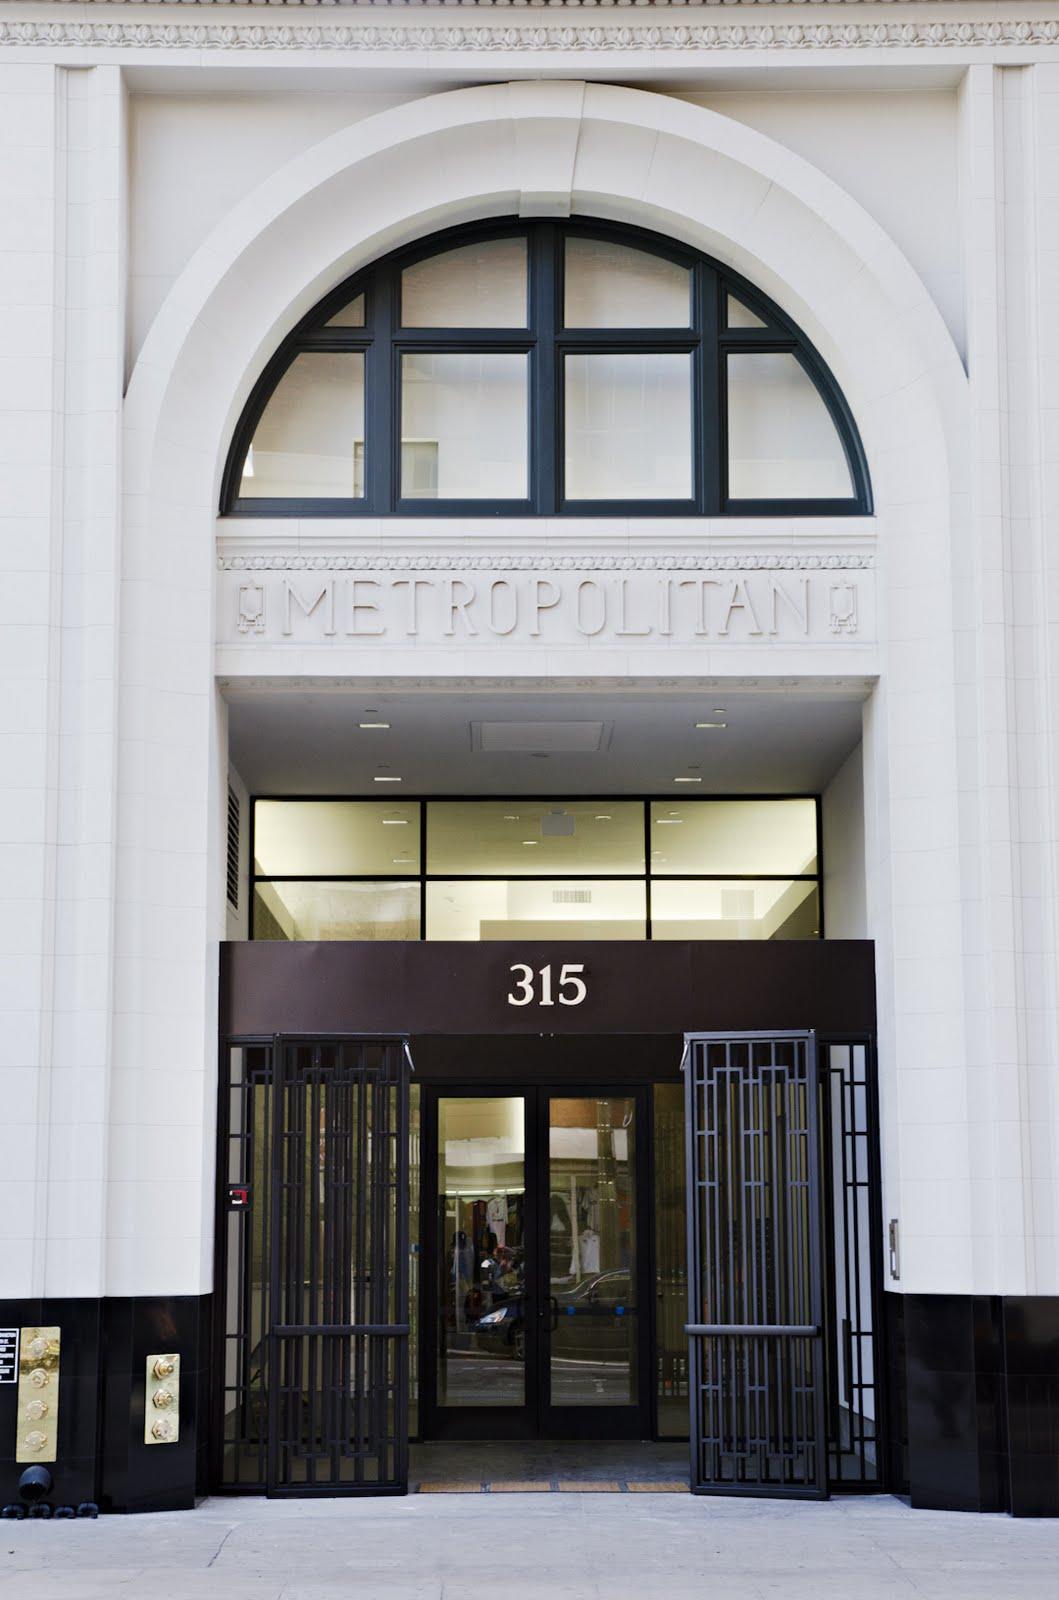 2011•01•18-The_Metropolitan-903-Color.jpg